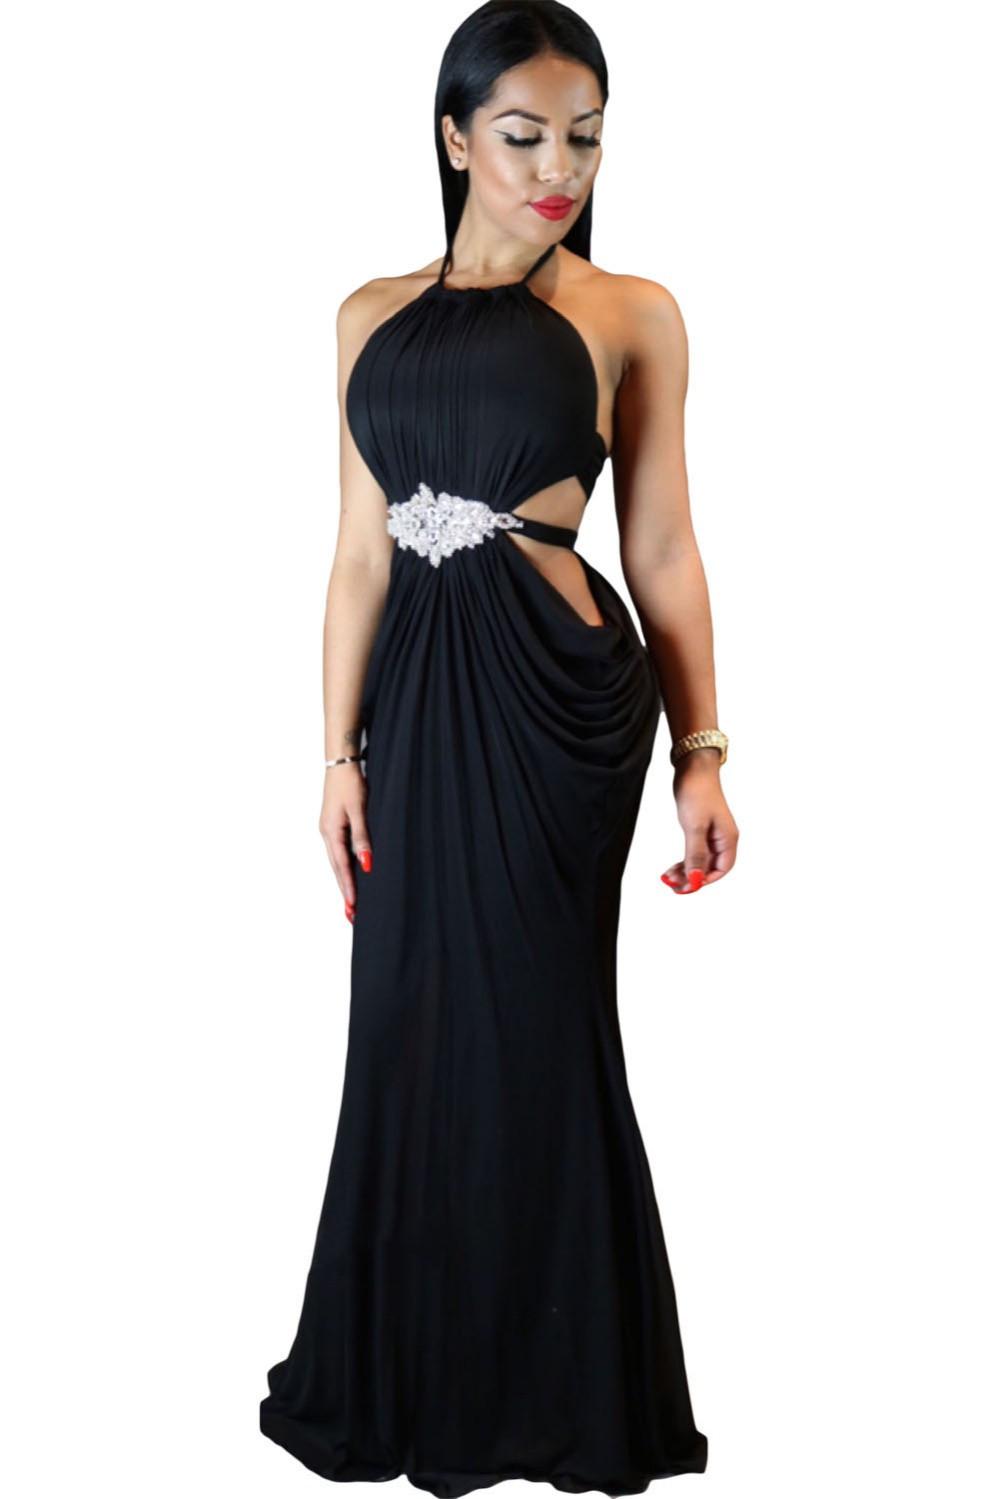 Draped Halter club dresses  at Bling Brides Bouquet - Online Bridal store